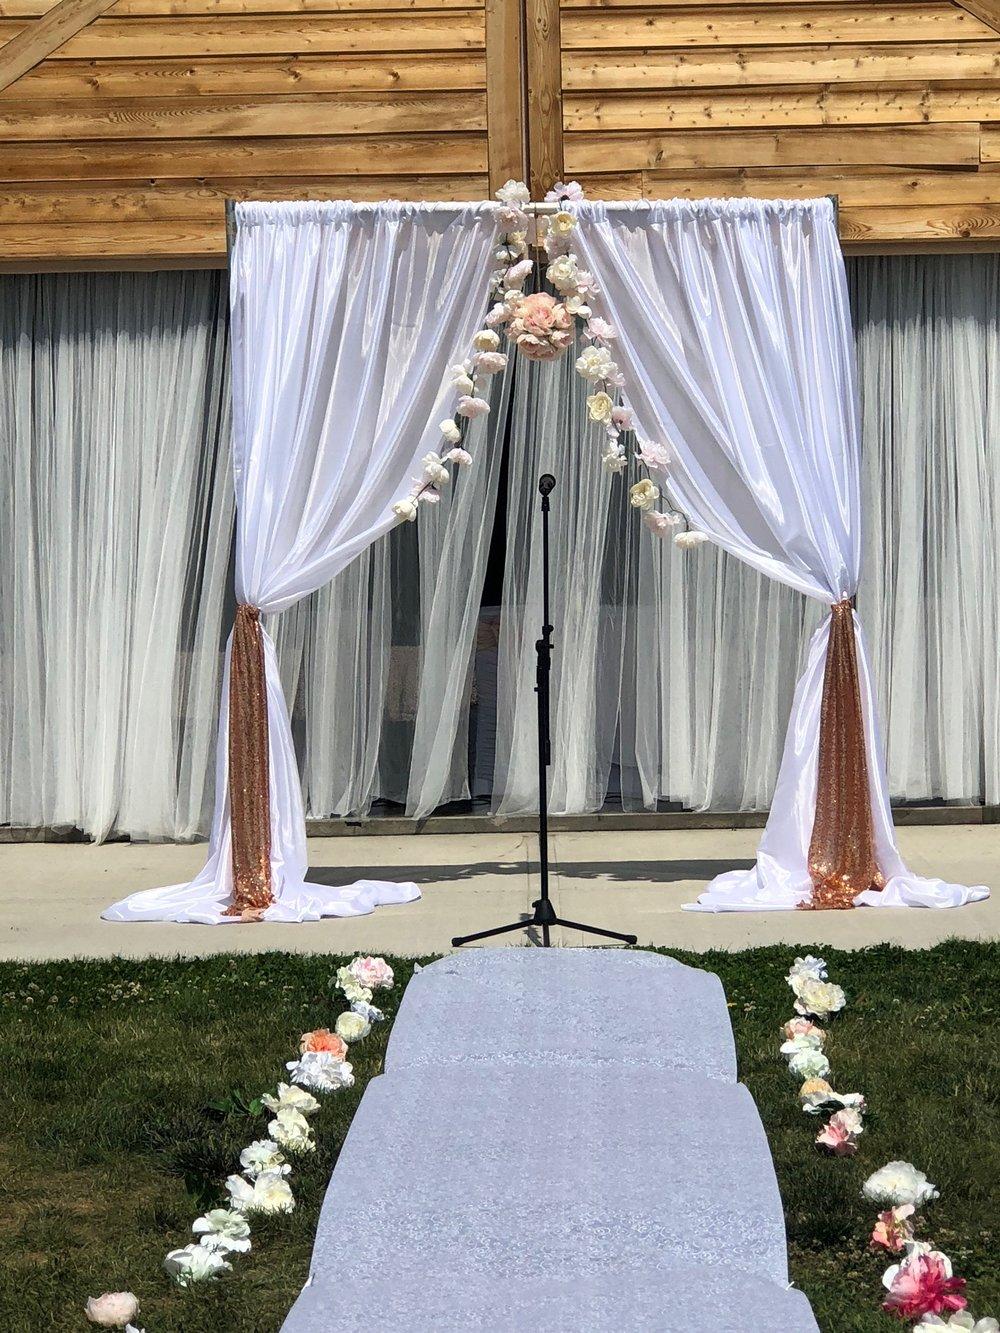 Olds Summer Wedding Ceremony